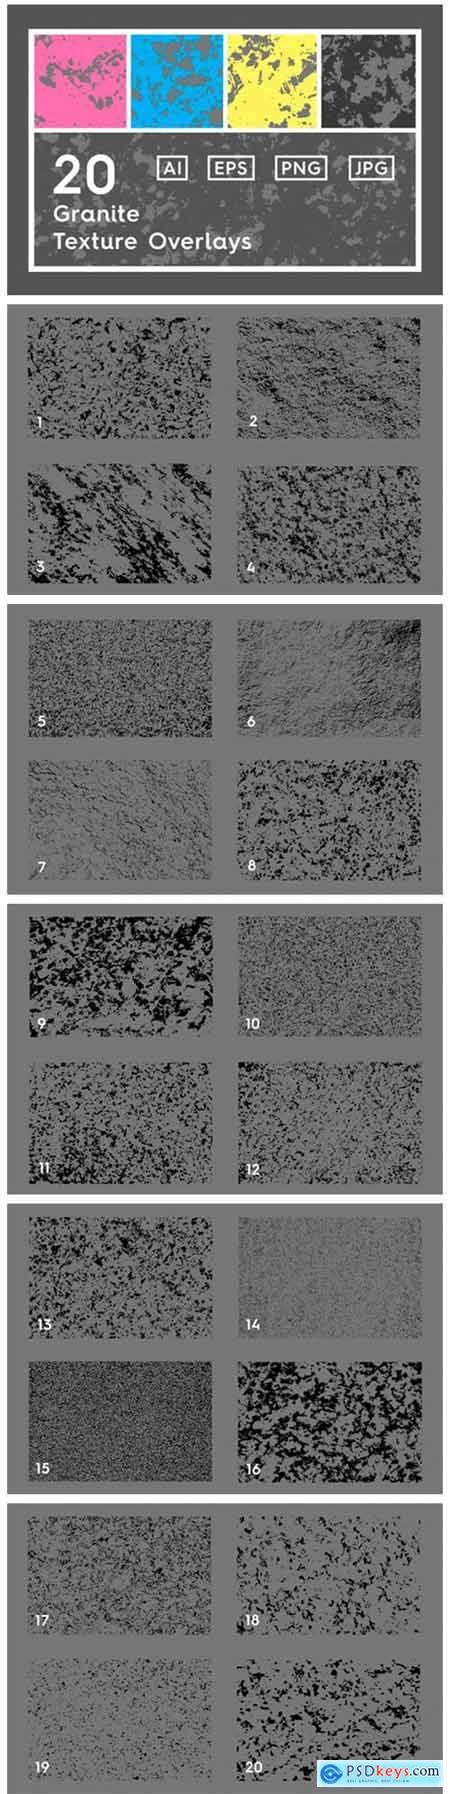 20 Granite Texture Overlays 5560478